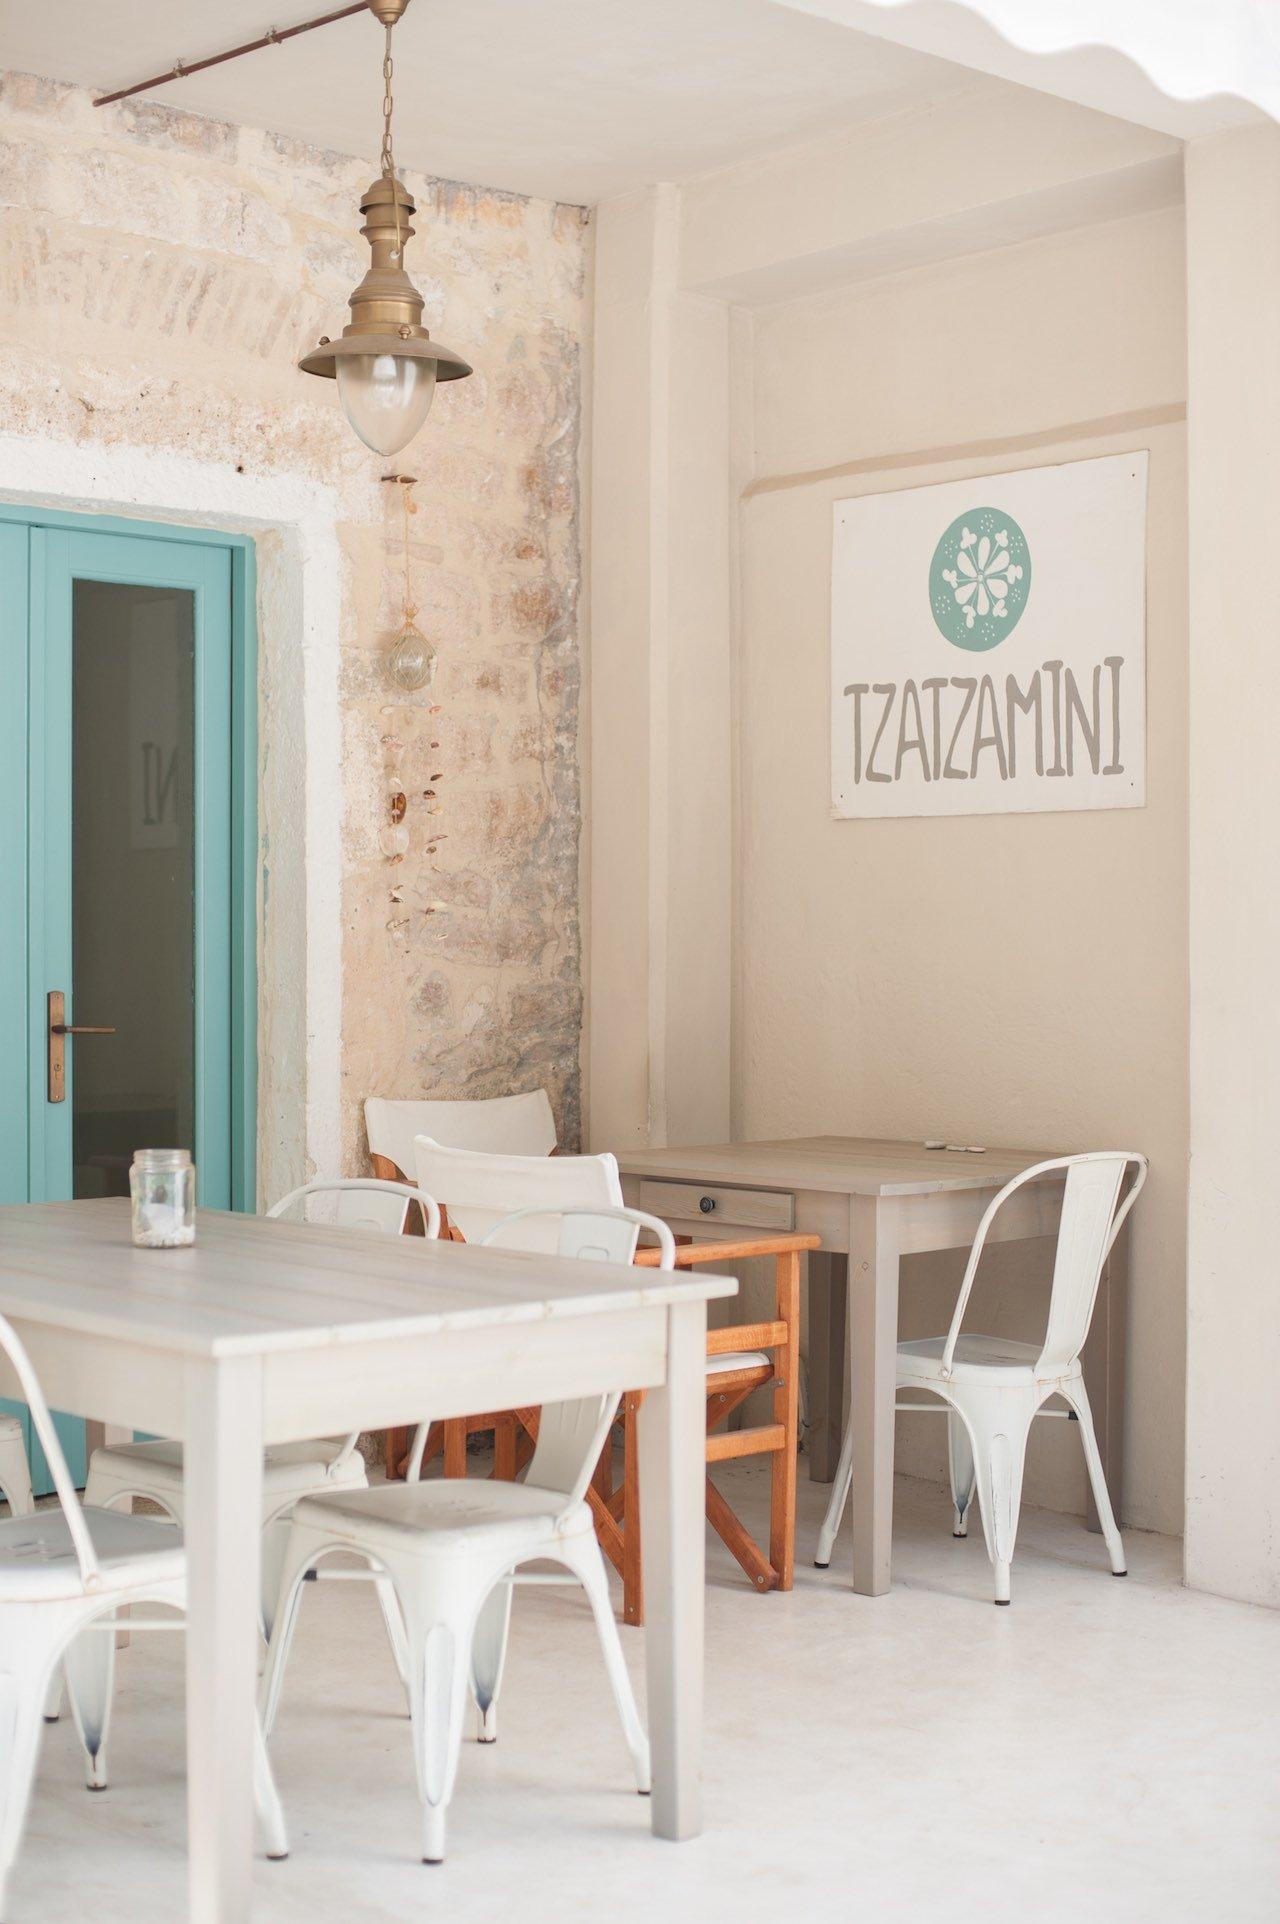 Tzatzamini Ithaka Greece